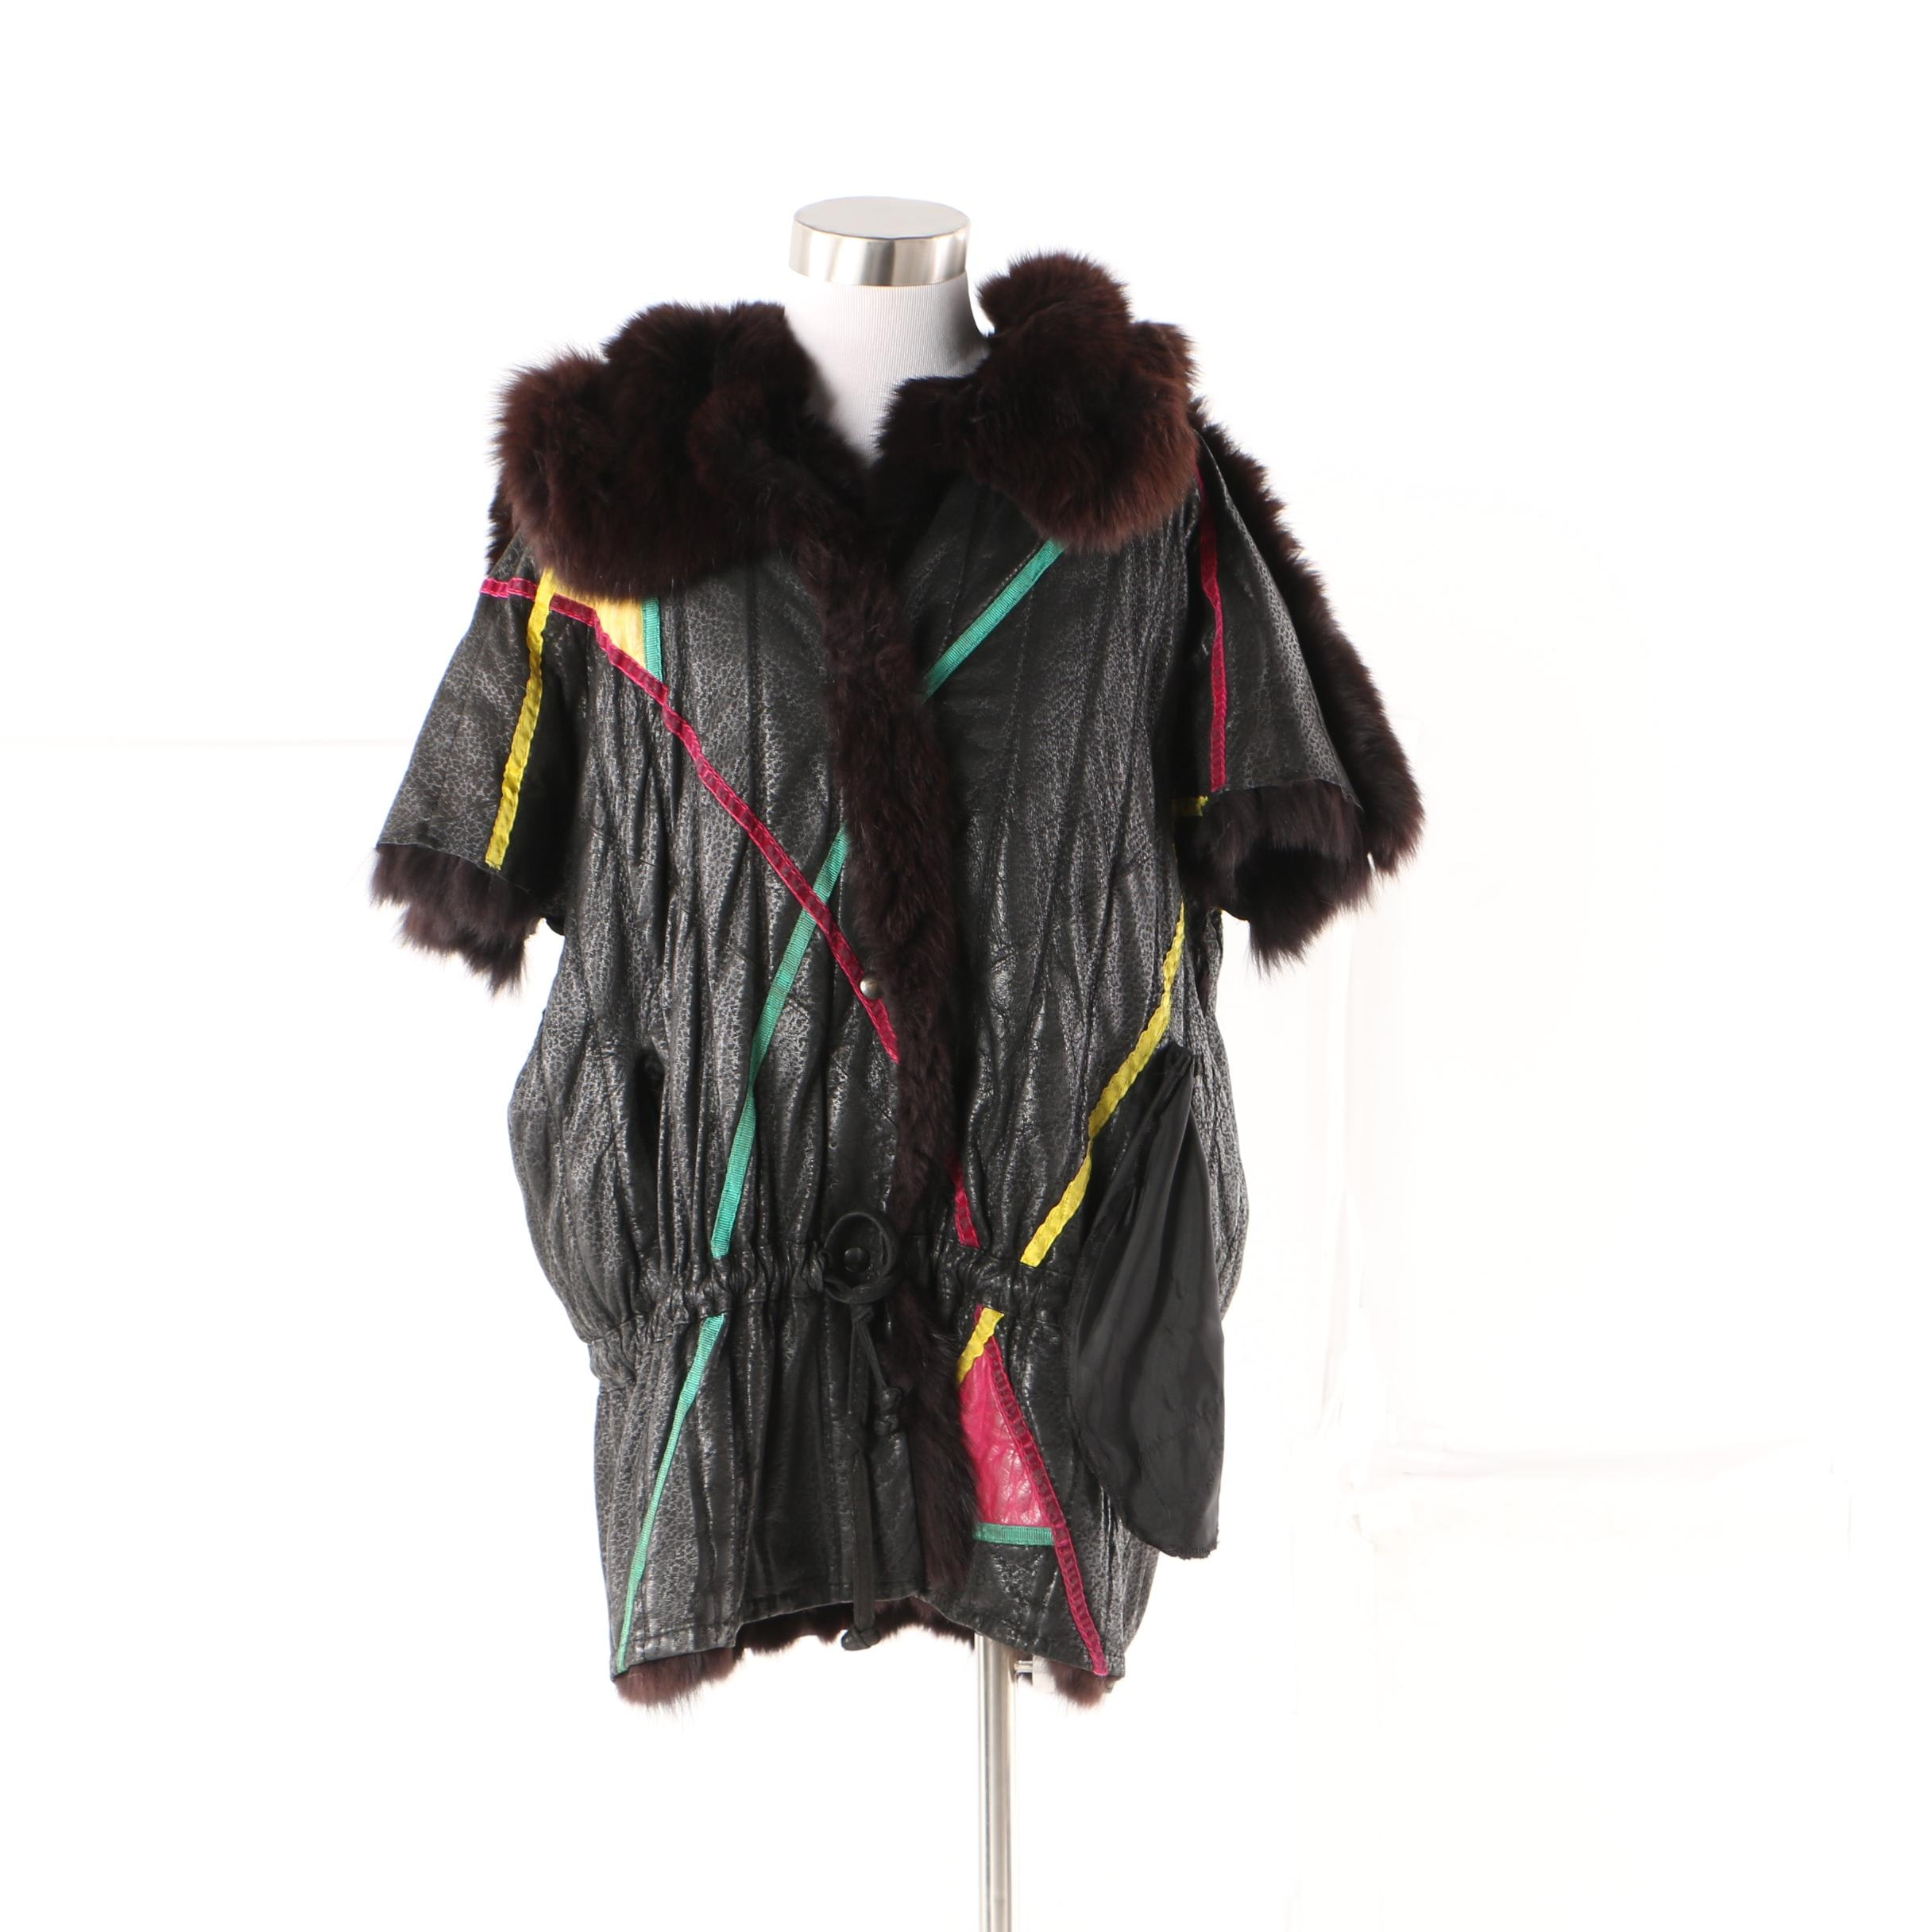 1980s Vintage Tarja Niskanen Reversible Leather and Fox Fur Jacket